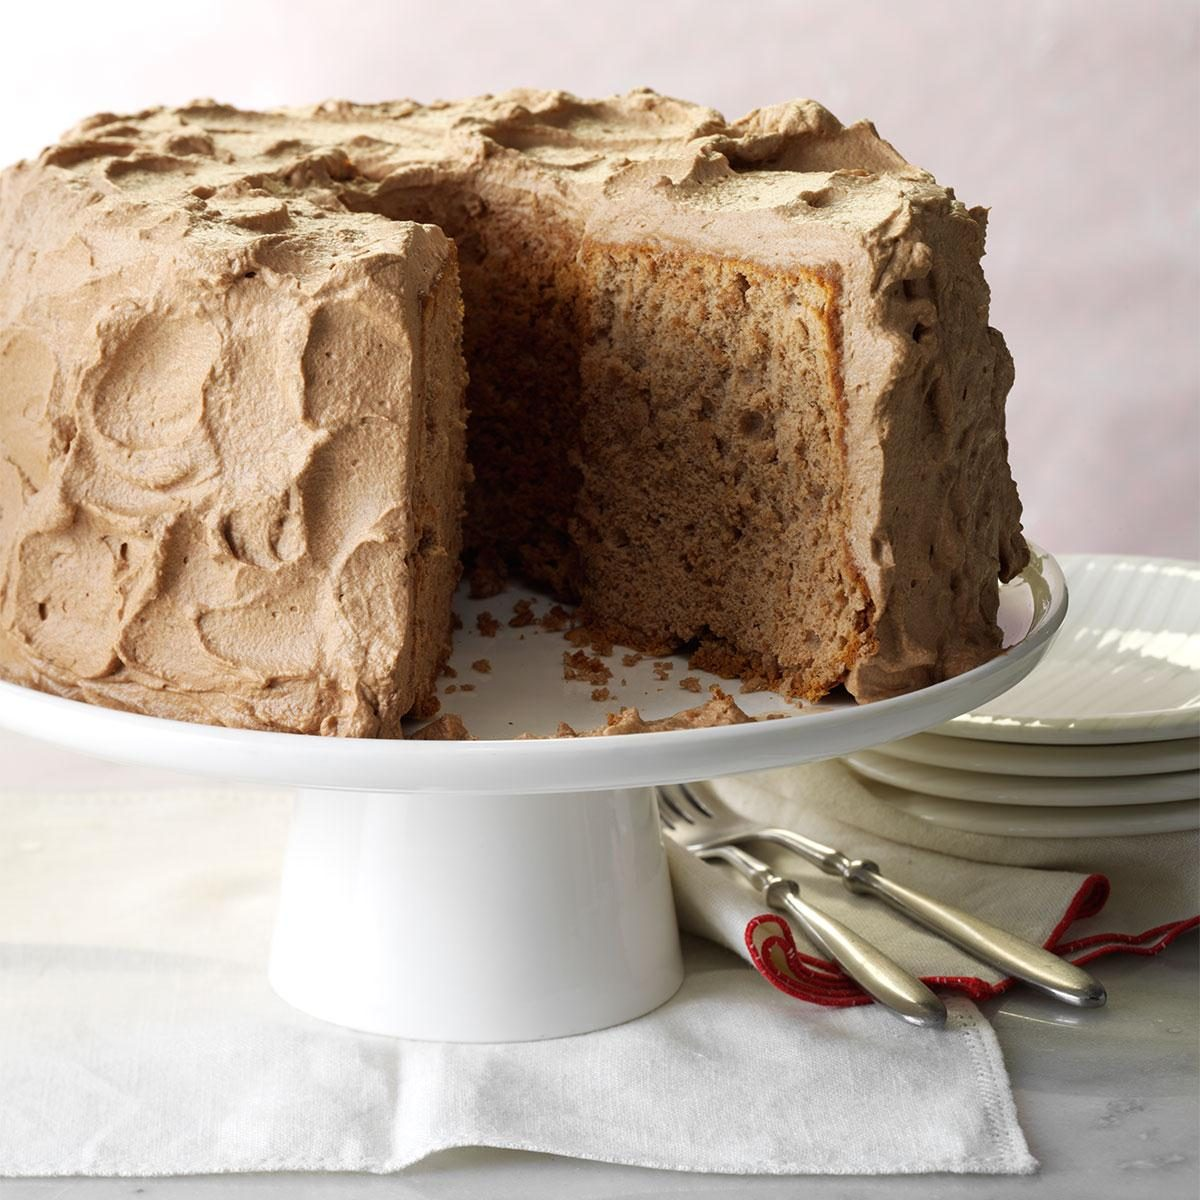 25 Light Chocolate Dessert Recipes | Taste of Home